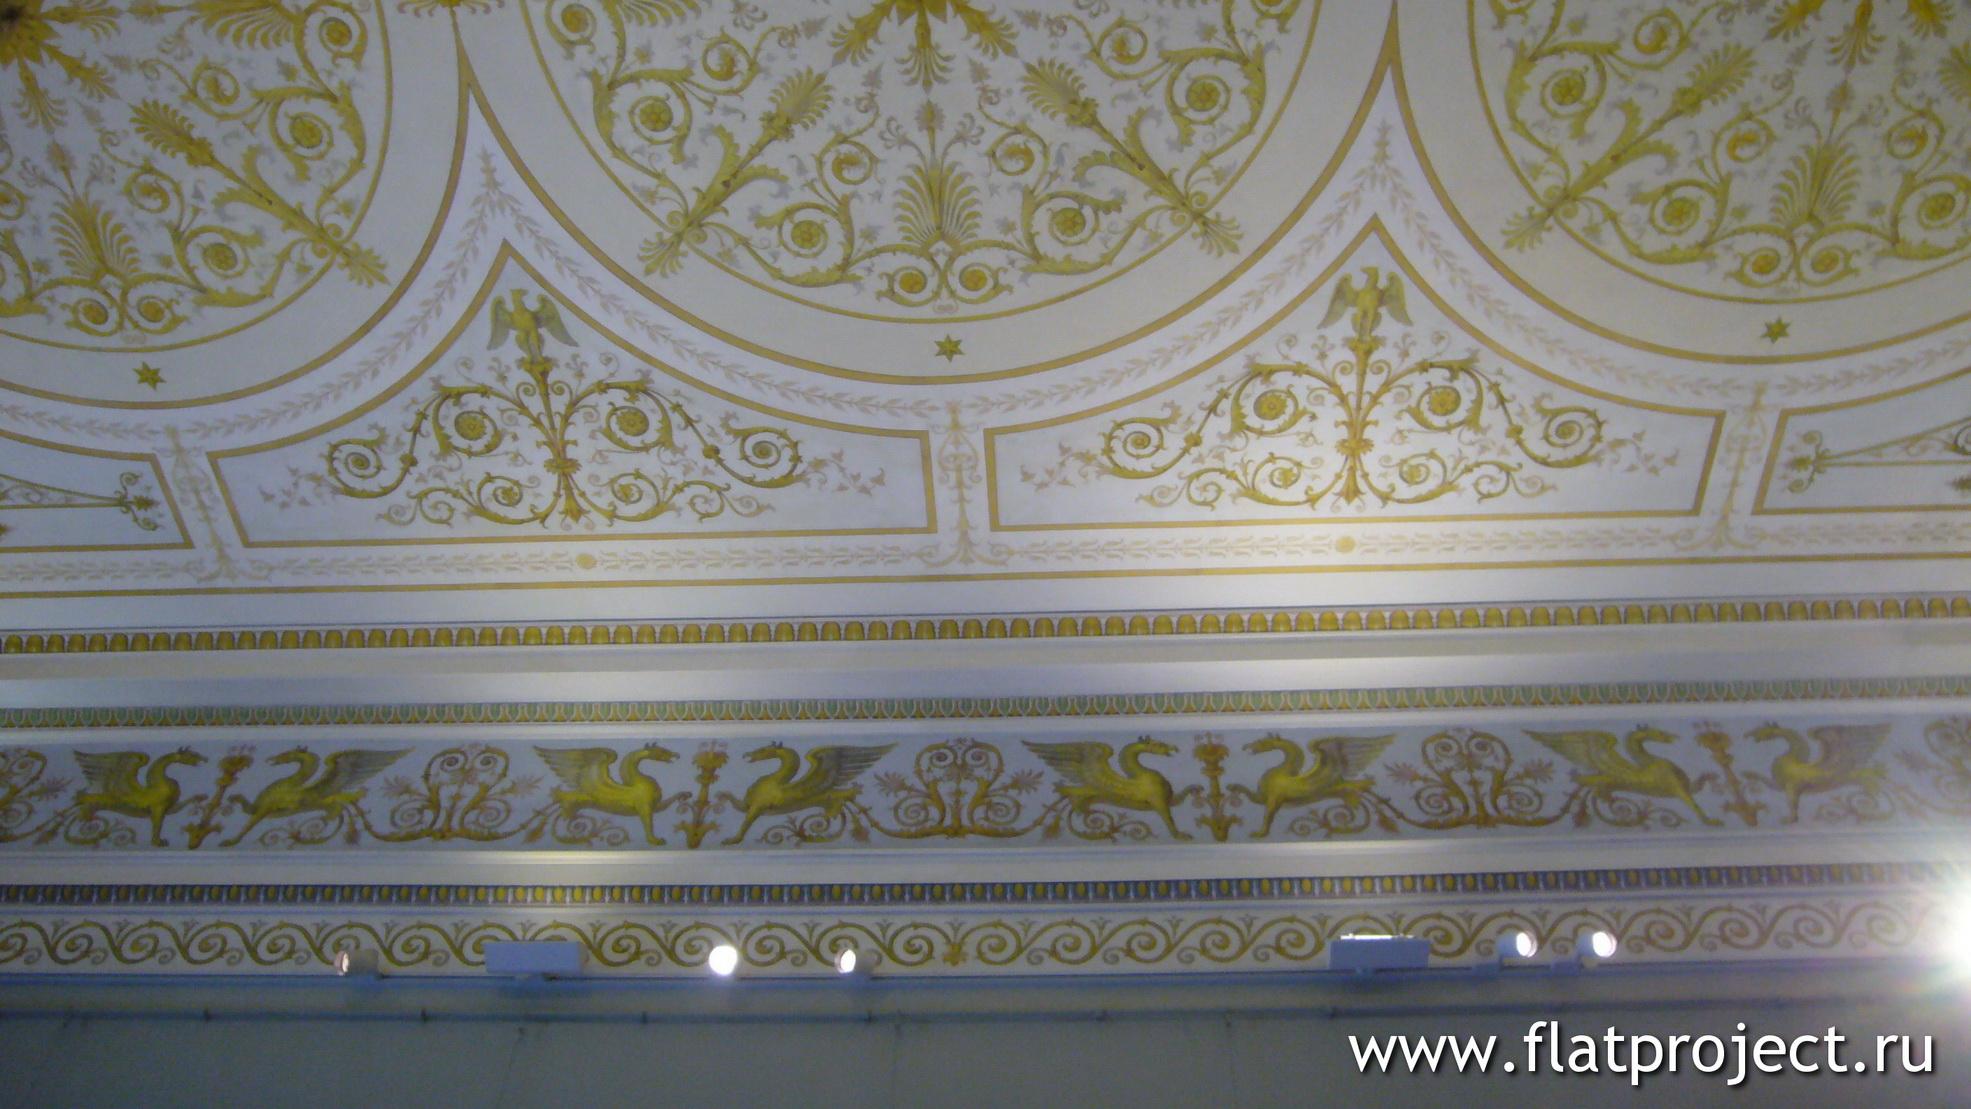 The State Hermitage museum interiors – photo 111